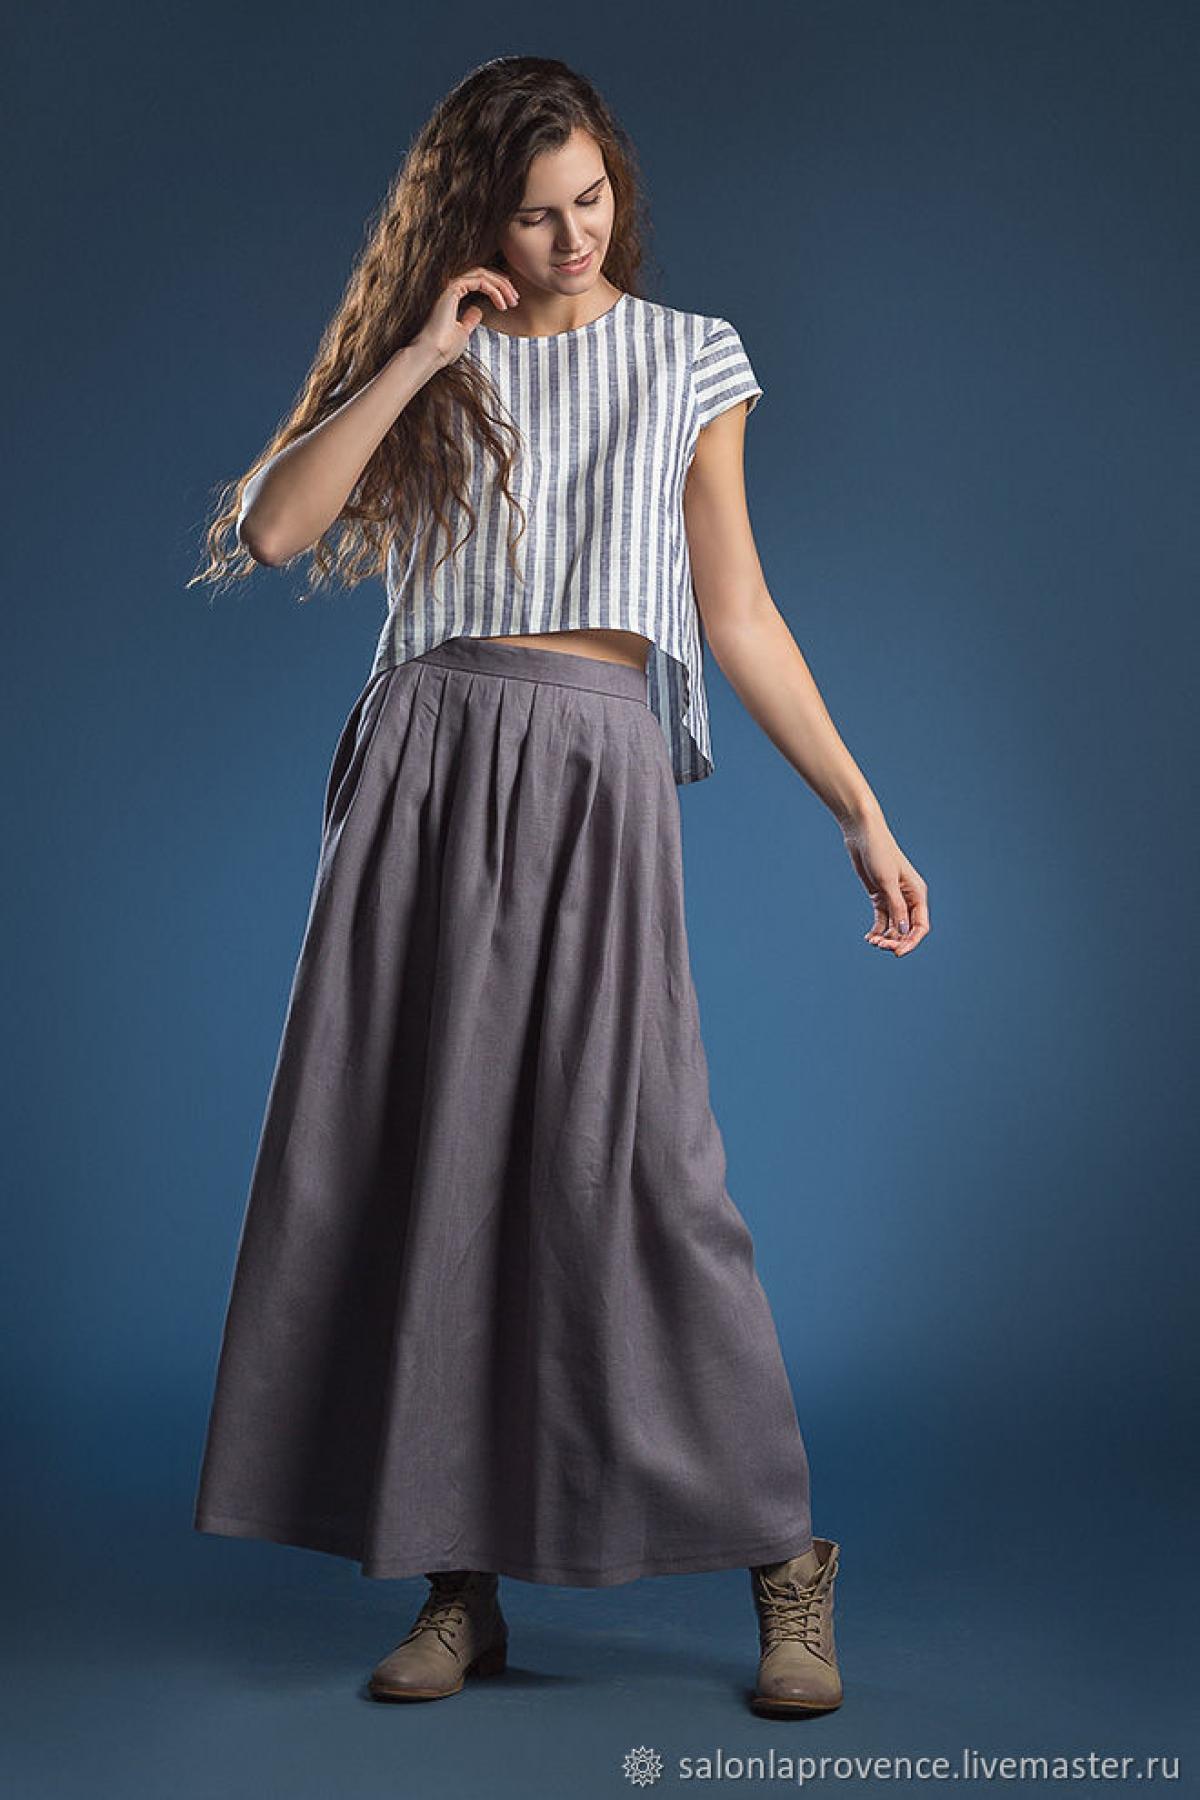 Блузка полоска и юбка лаванда - suzdalshop